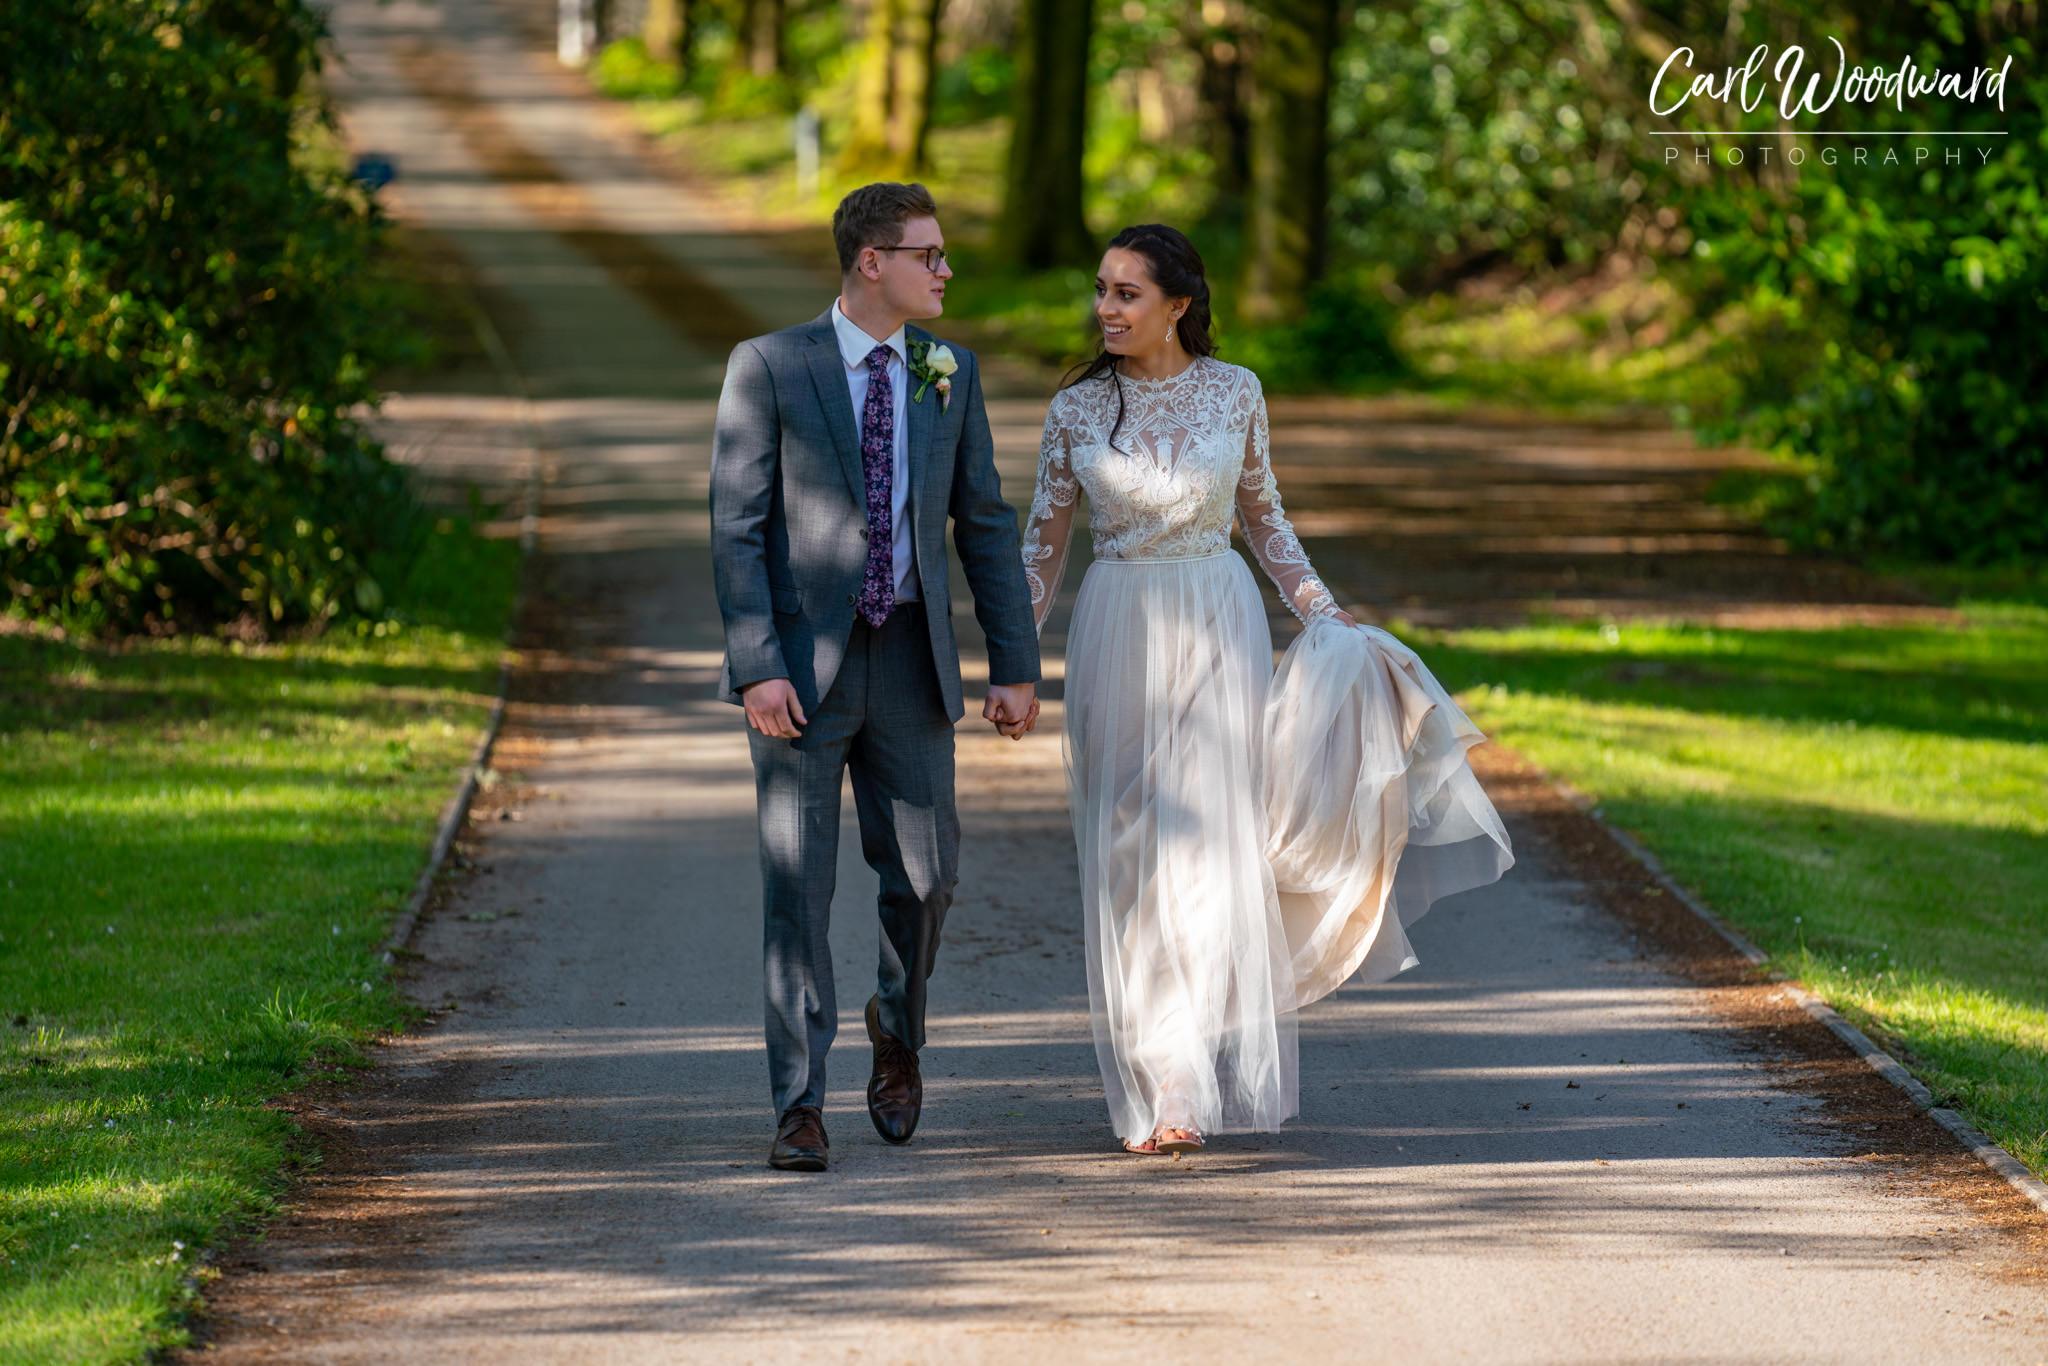 019-pencoed-house-estate-wedding-wedding-photography-cardiff-wedding-photographer.jpg